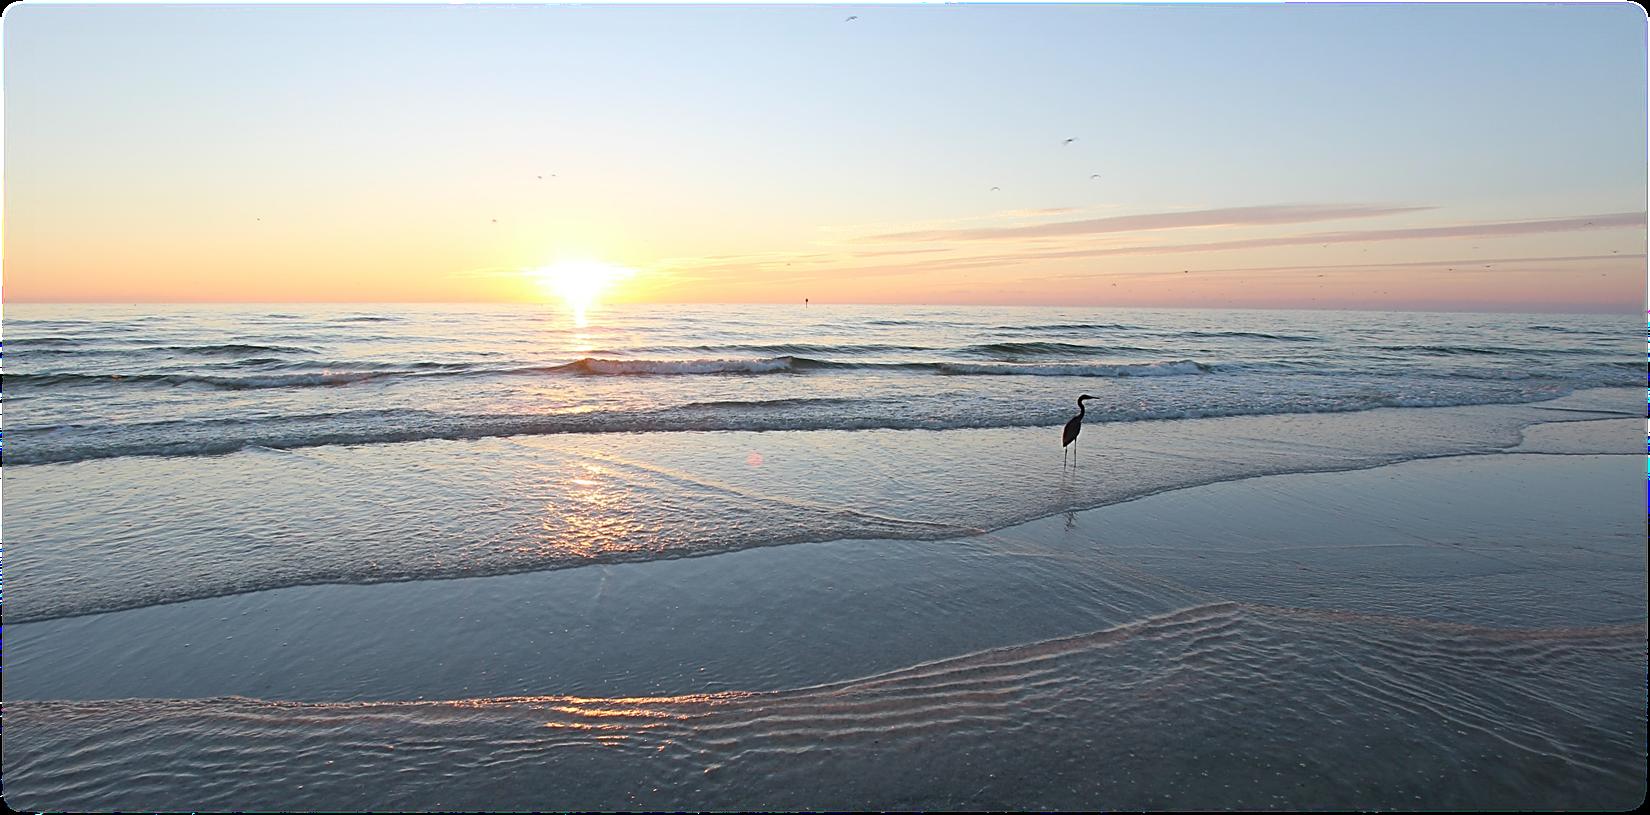 Enjoy a warm sunset this winter or spring on Manasota Key ...